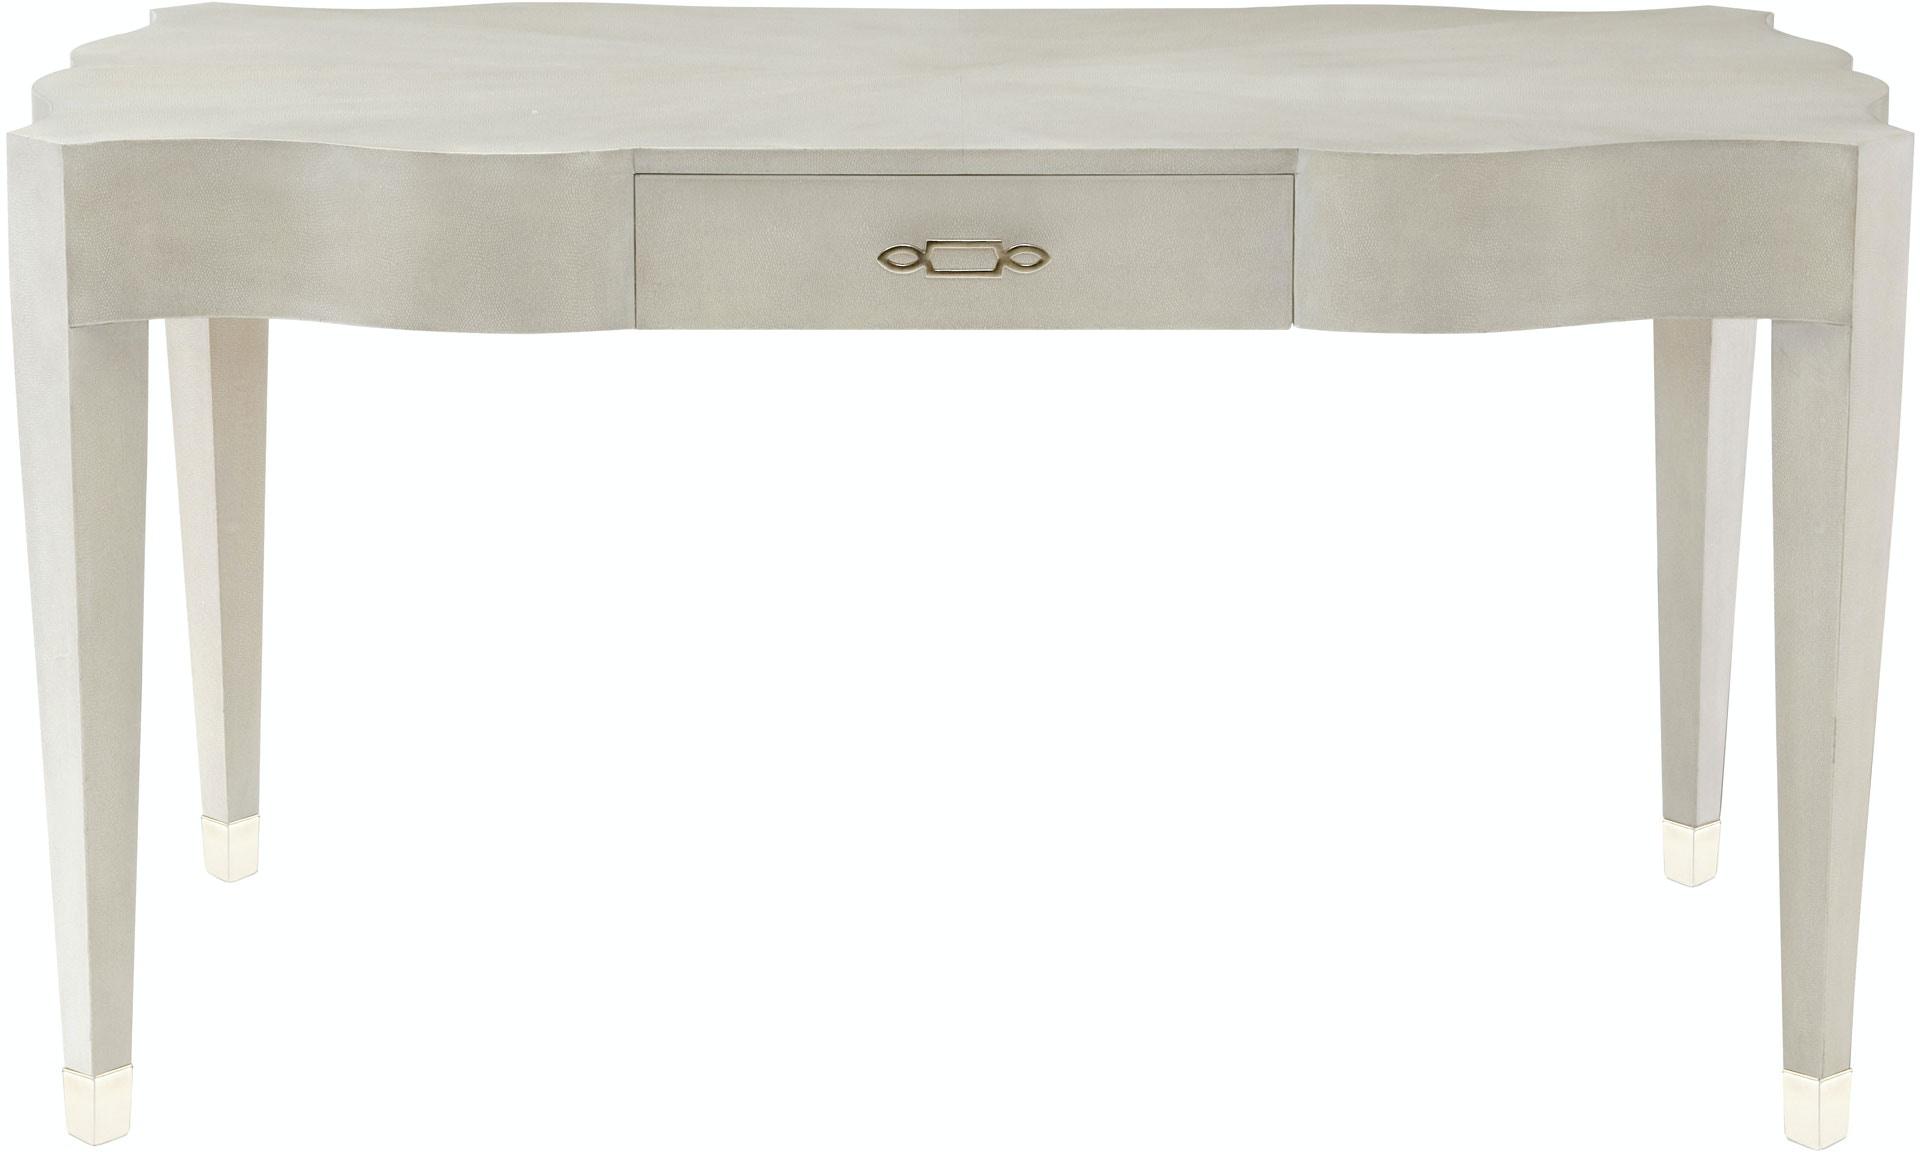 bernhardt furniture 363-512g home office criteria leather desk